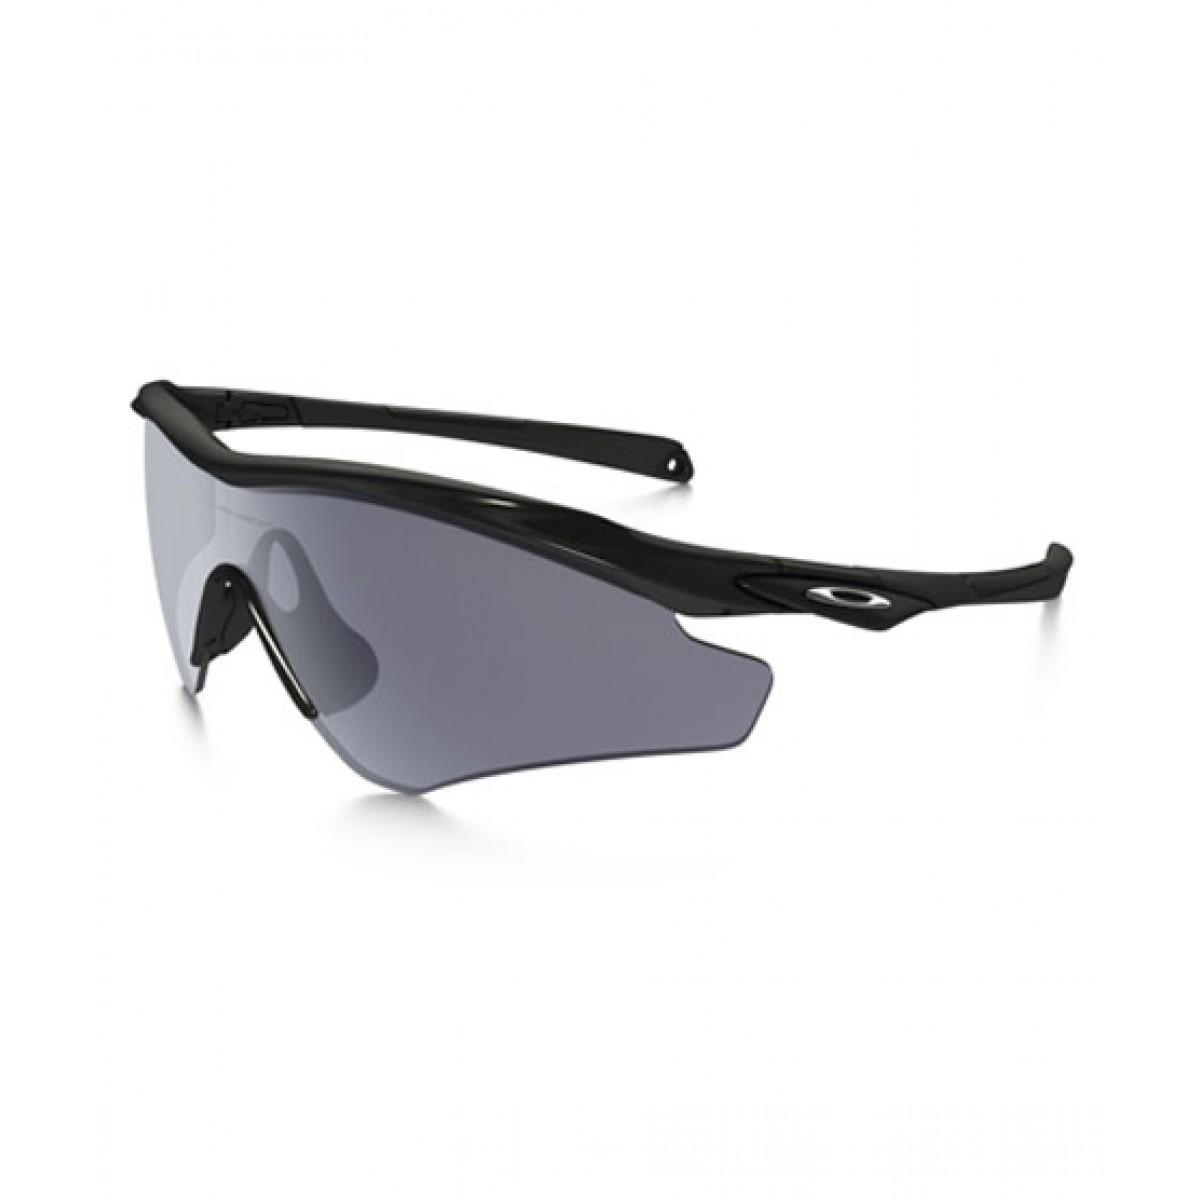 73f83445156 Oakley M2 Frame XL Men s Sunglasses Price in Pakistan